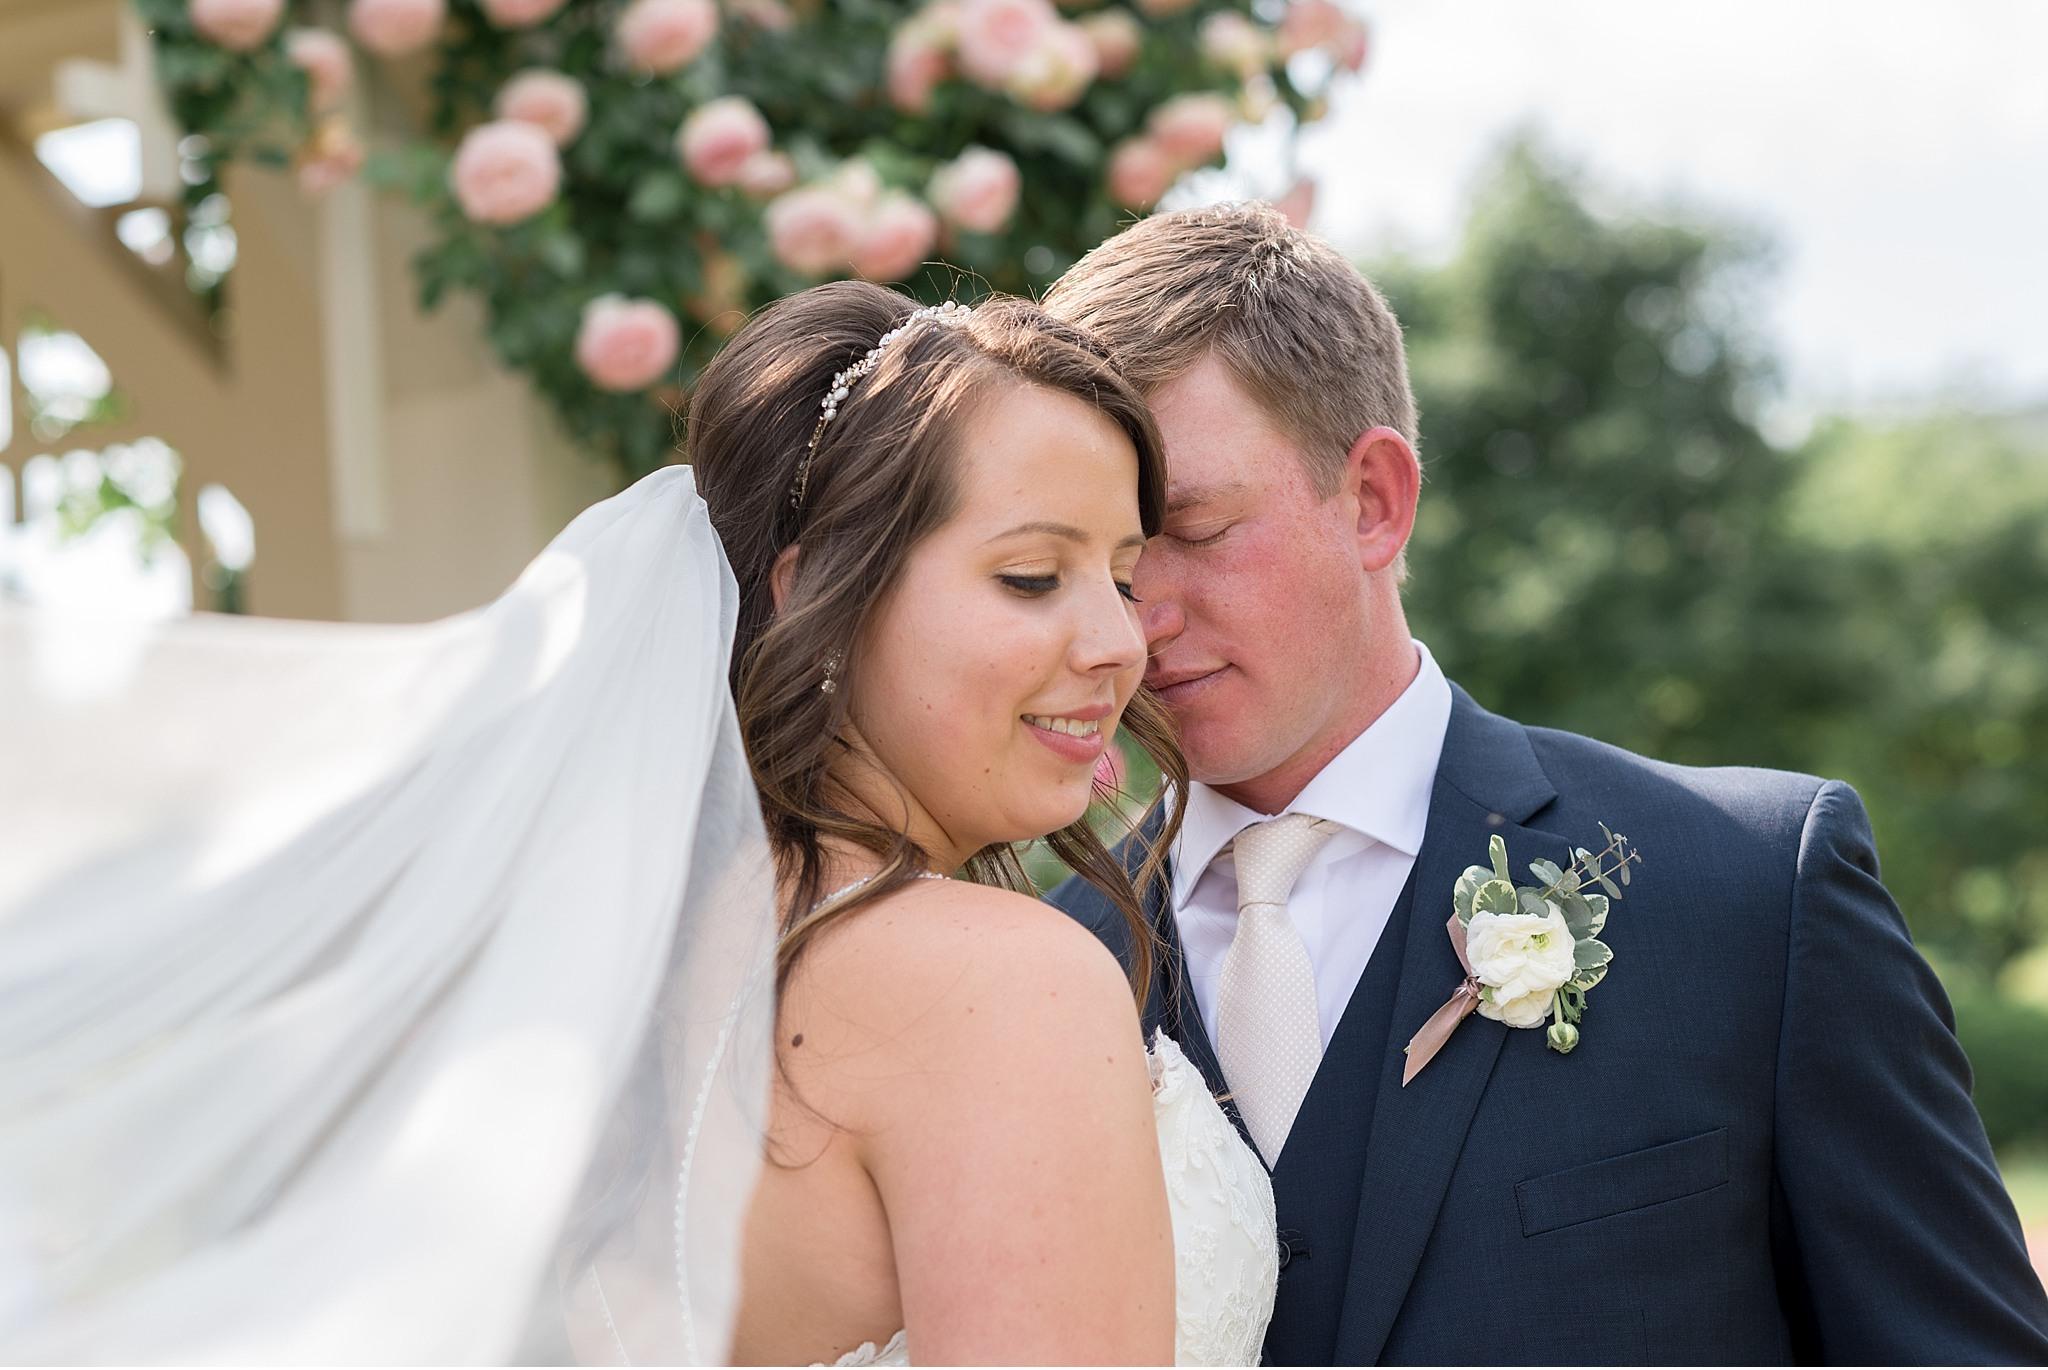 Bride and Groom Veil Hershey Gardens Hershey Country Club Summer beautiful wedding photography_1599.jpg